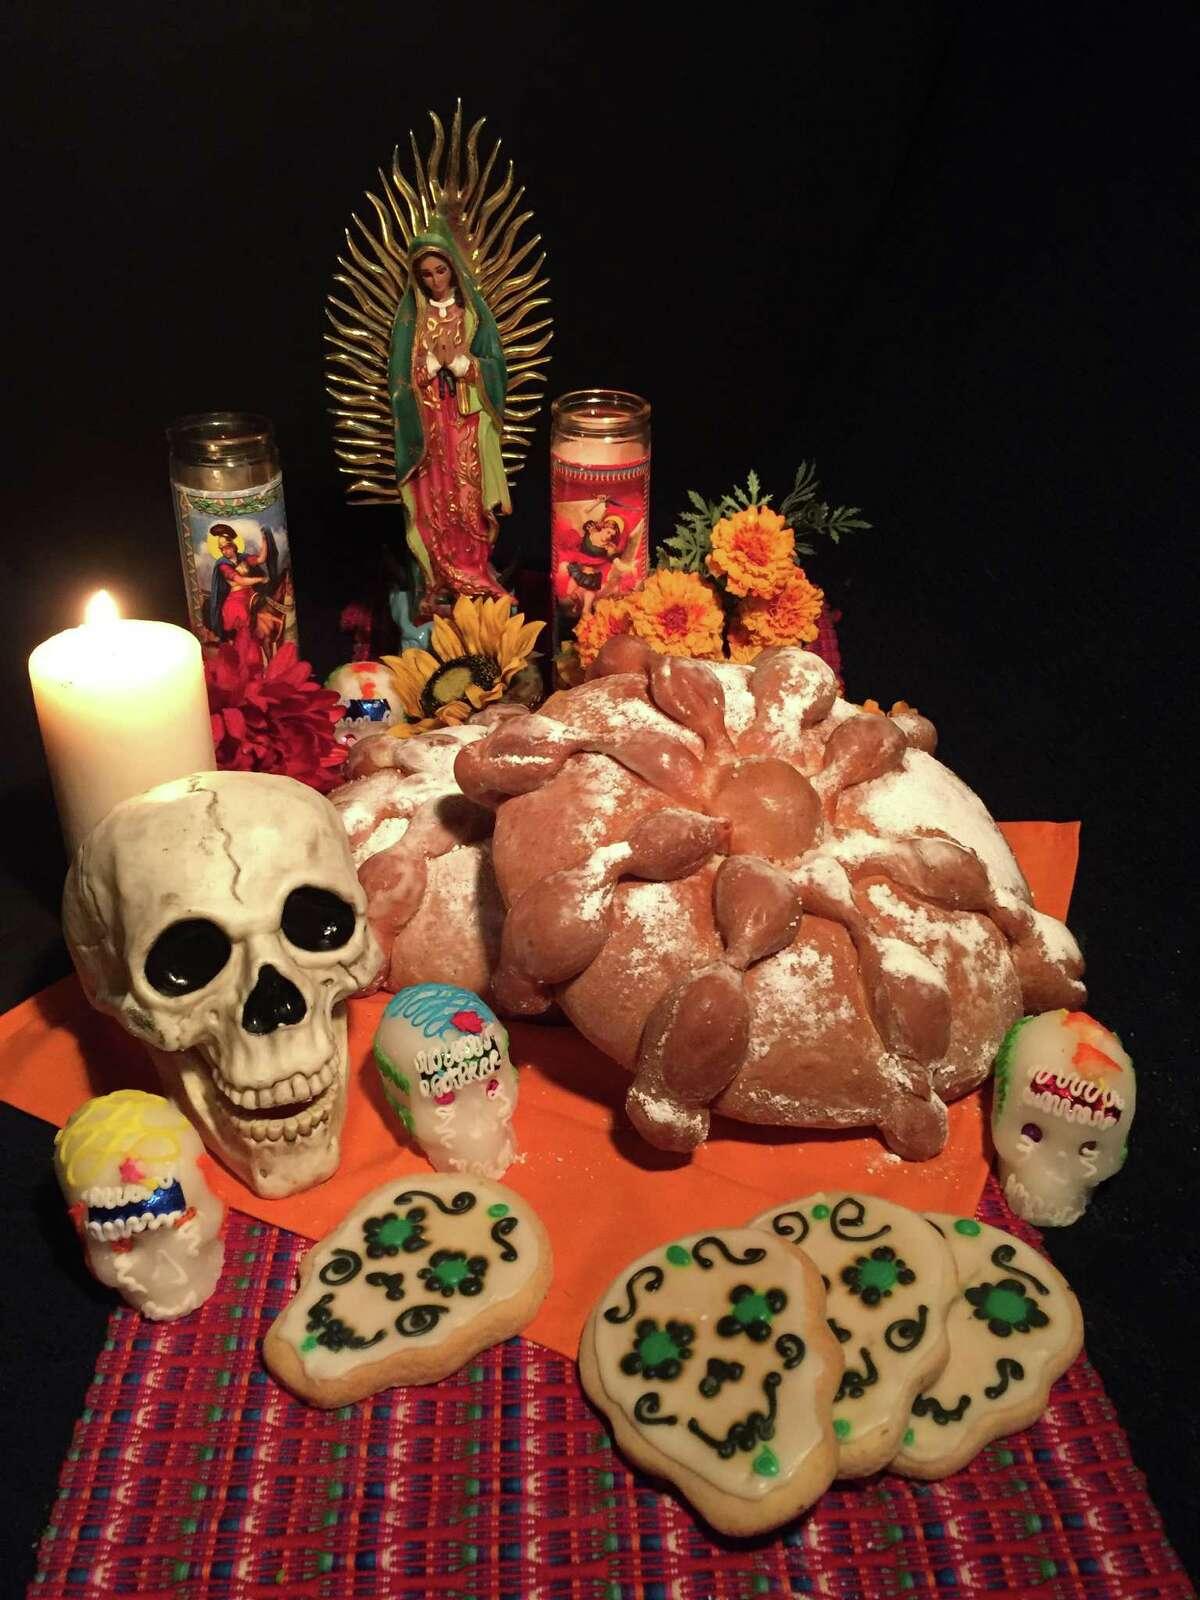 A display for Día de los Muertos: pan de muerto, candles, cookies, sugar skulls and Our Lady of Guadalupe